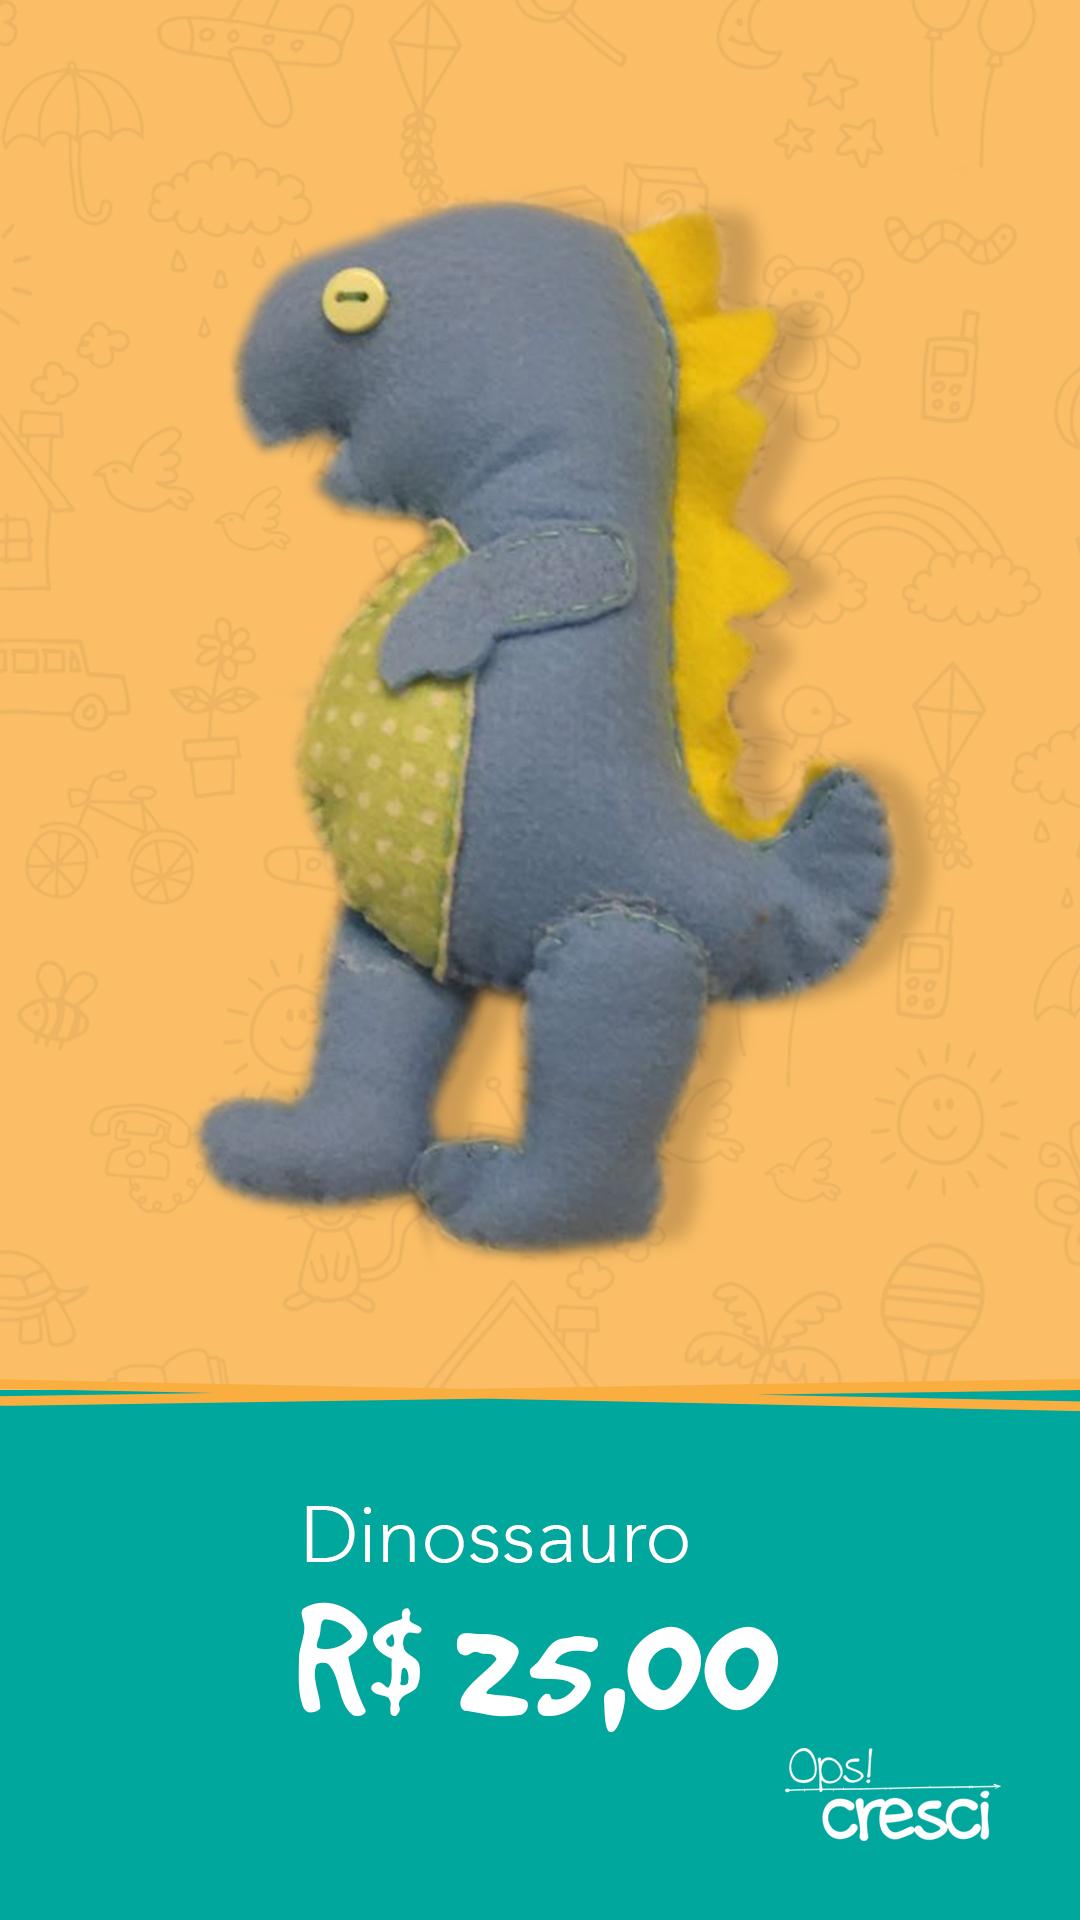 Stories - Brinquedos - 03